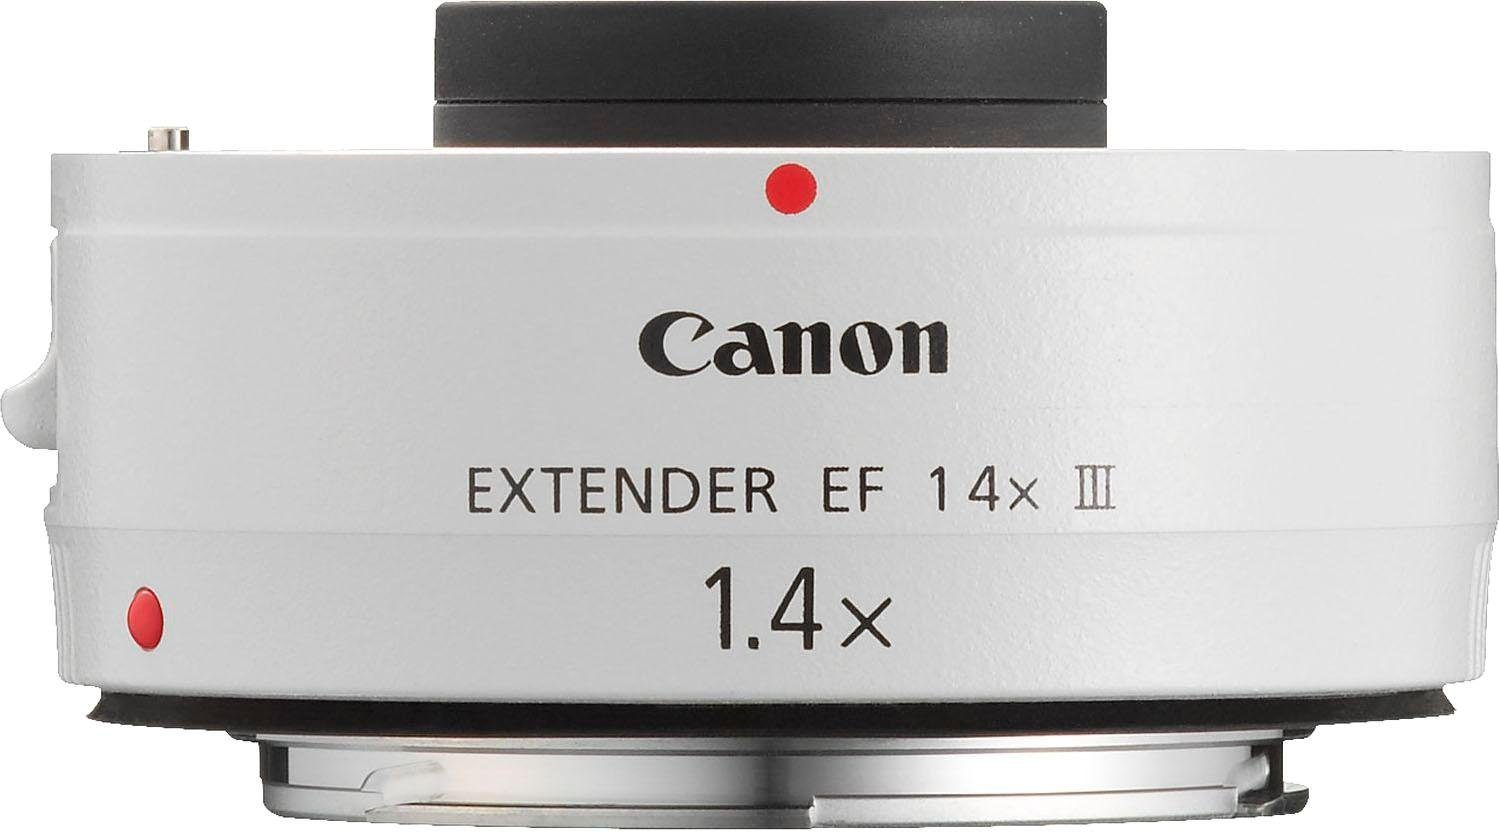 Canon »EXTENDER EF 1.4X III« Objektiv